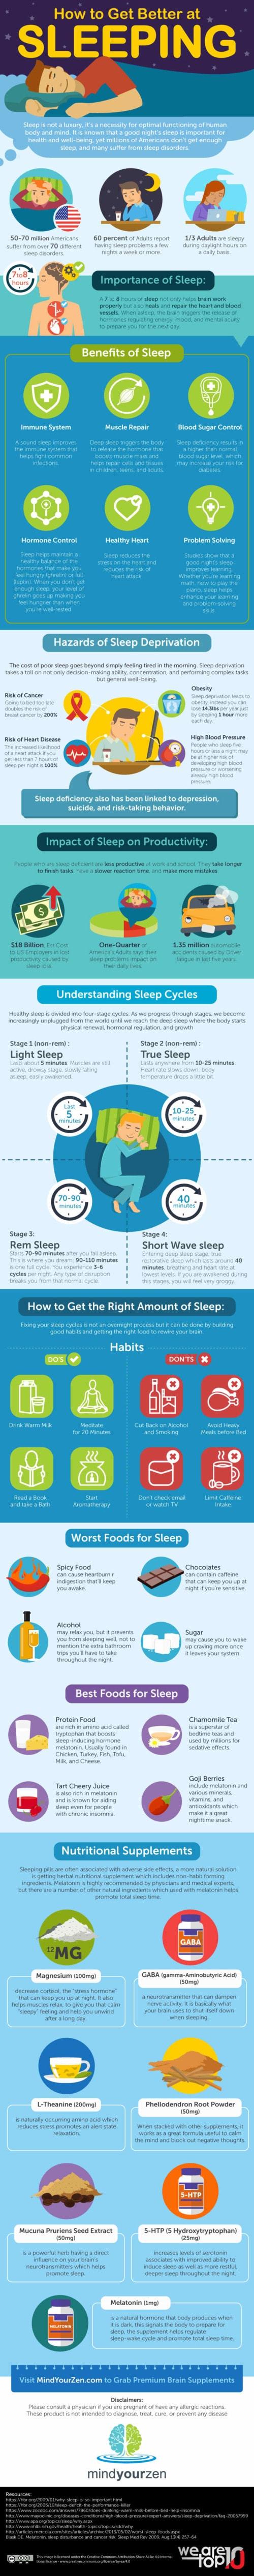 How to Get a Better Nights Sleep  #sleeping #insomnia #depri... via MorningMotivation